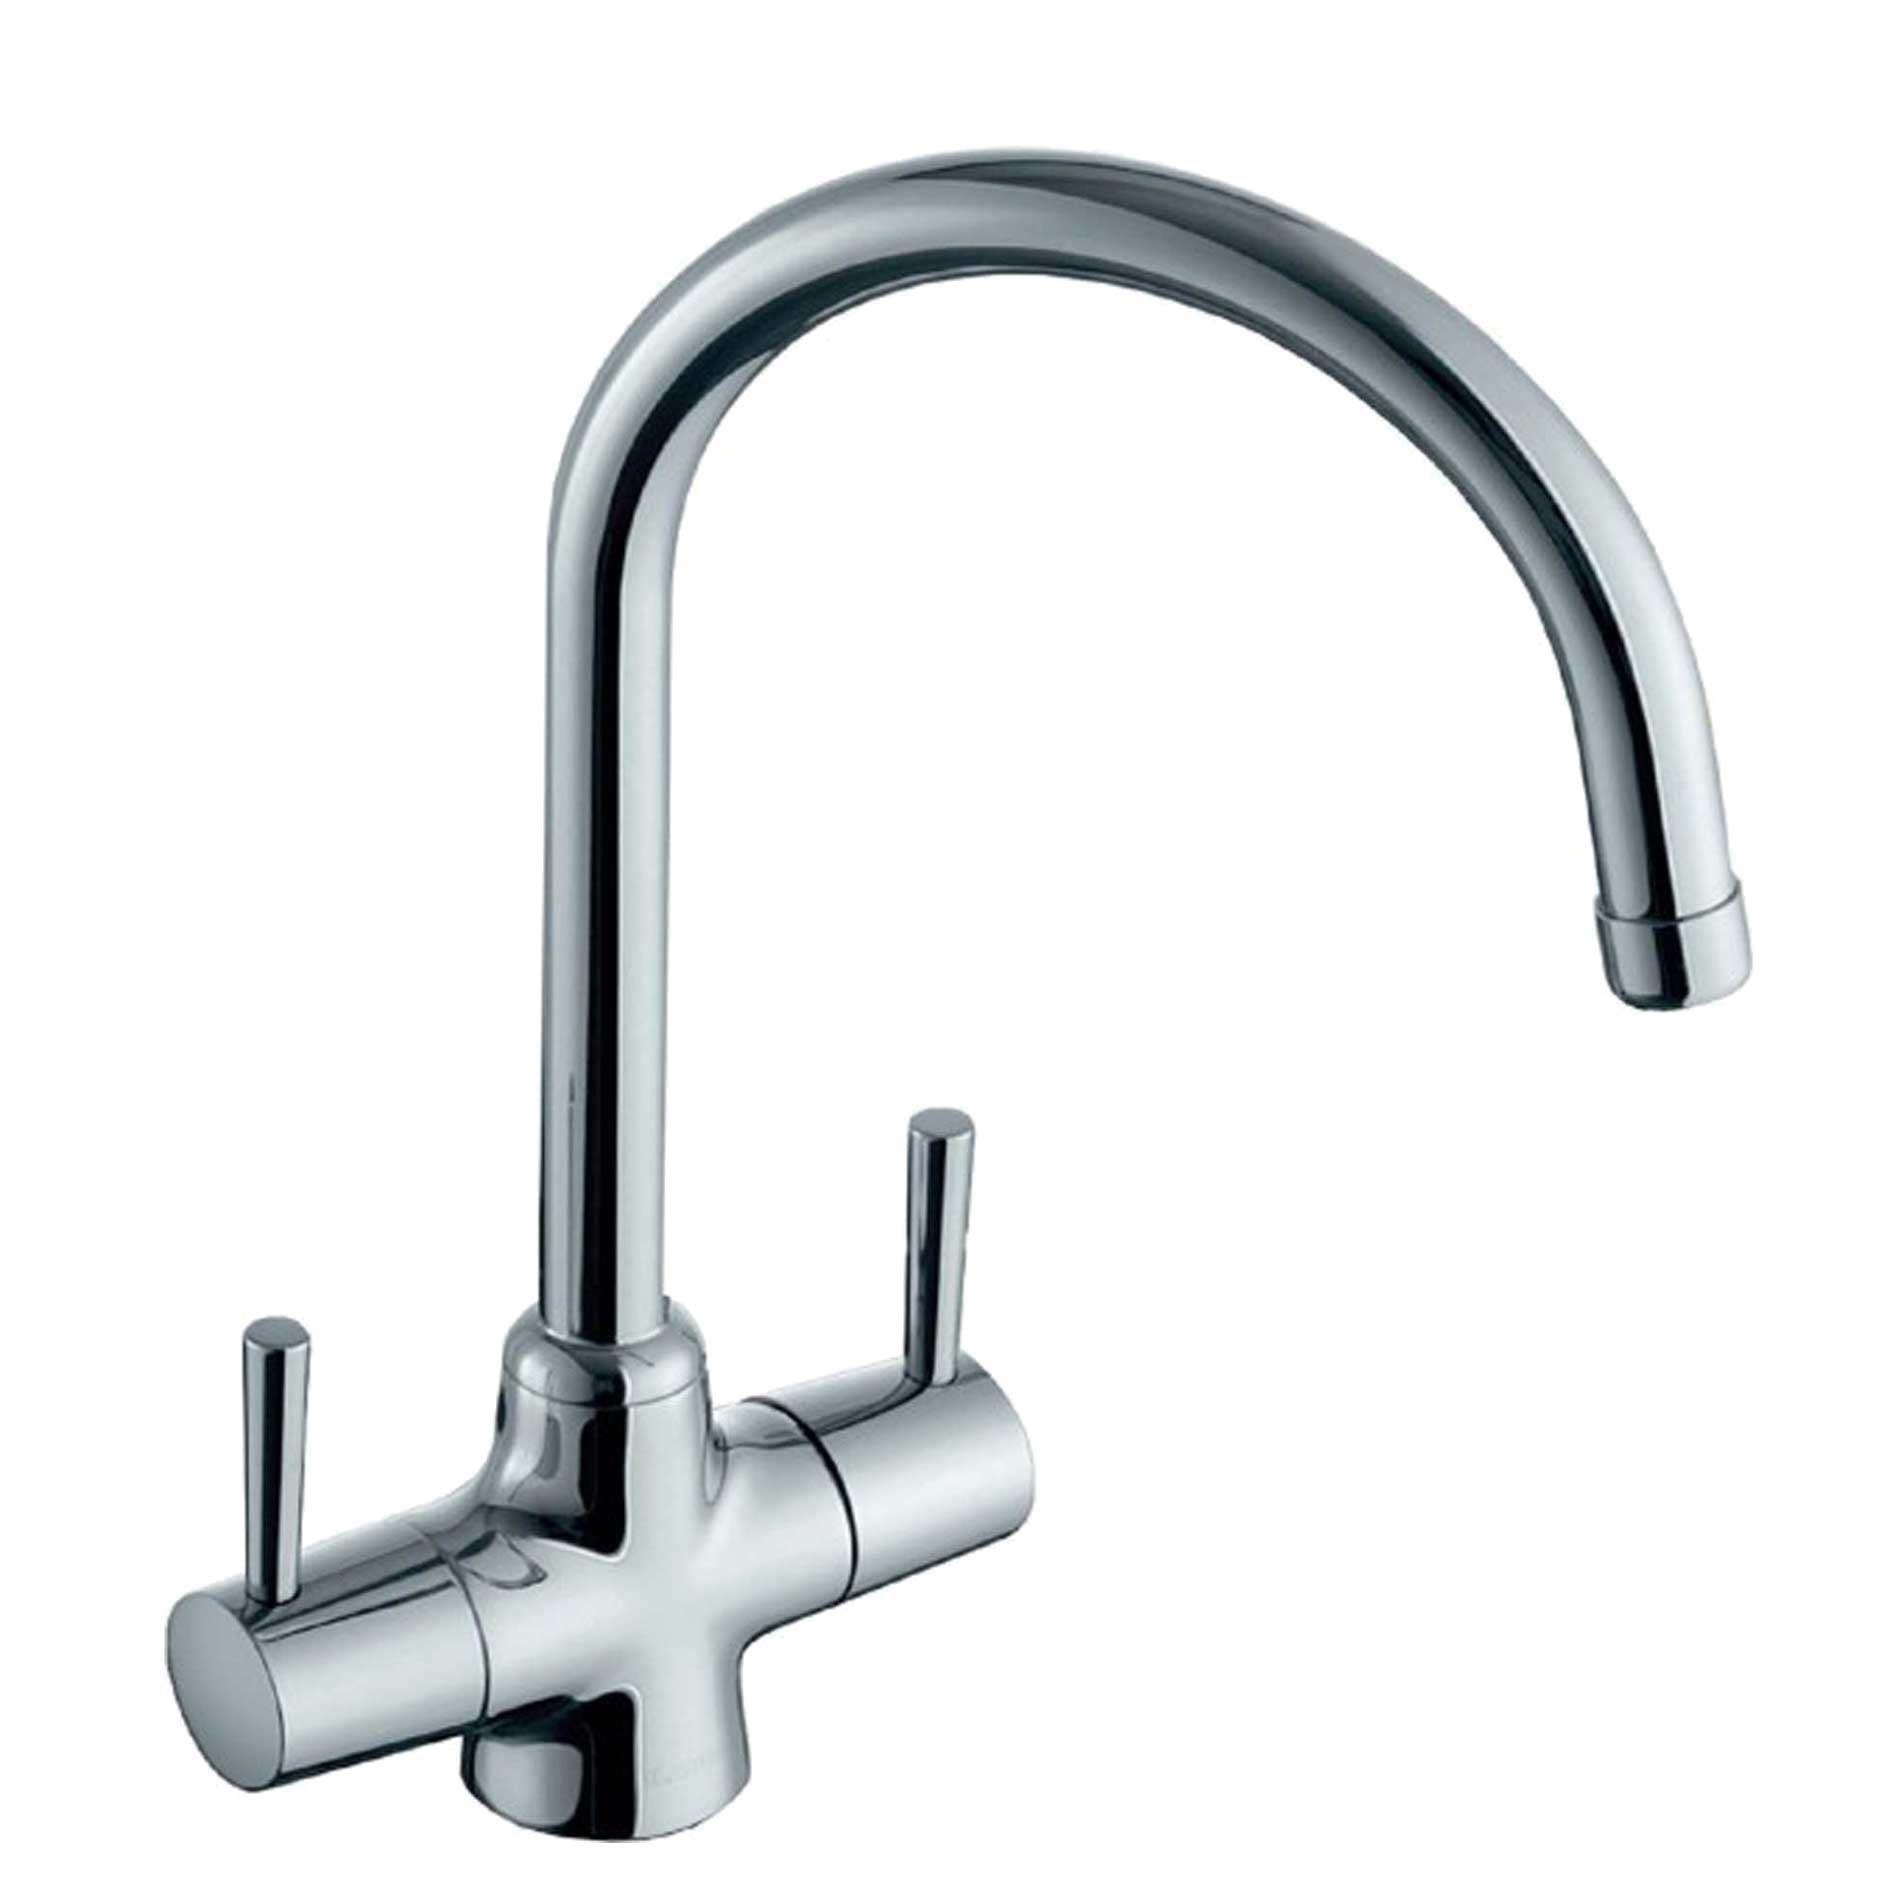 chrome-tap